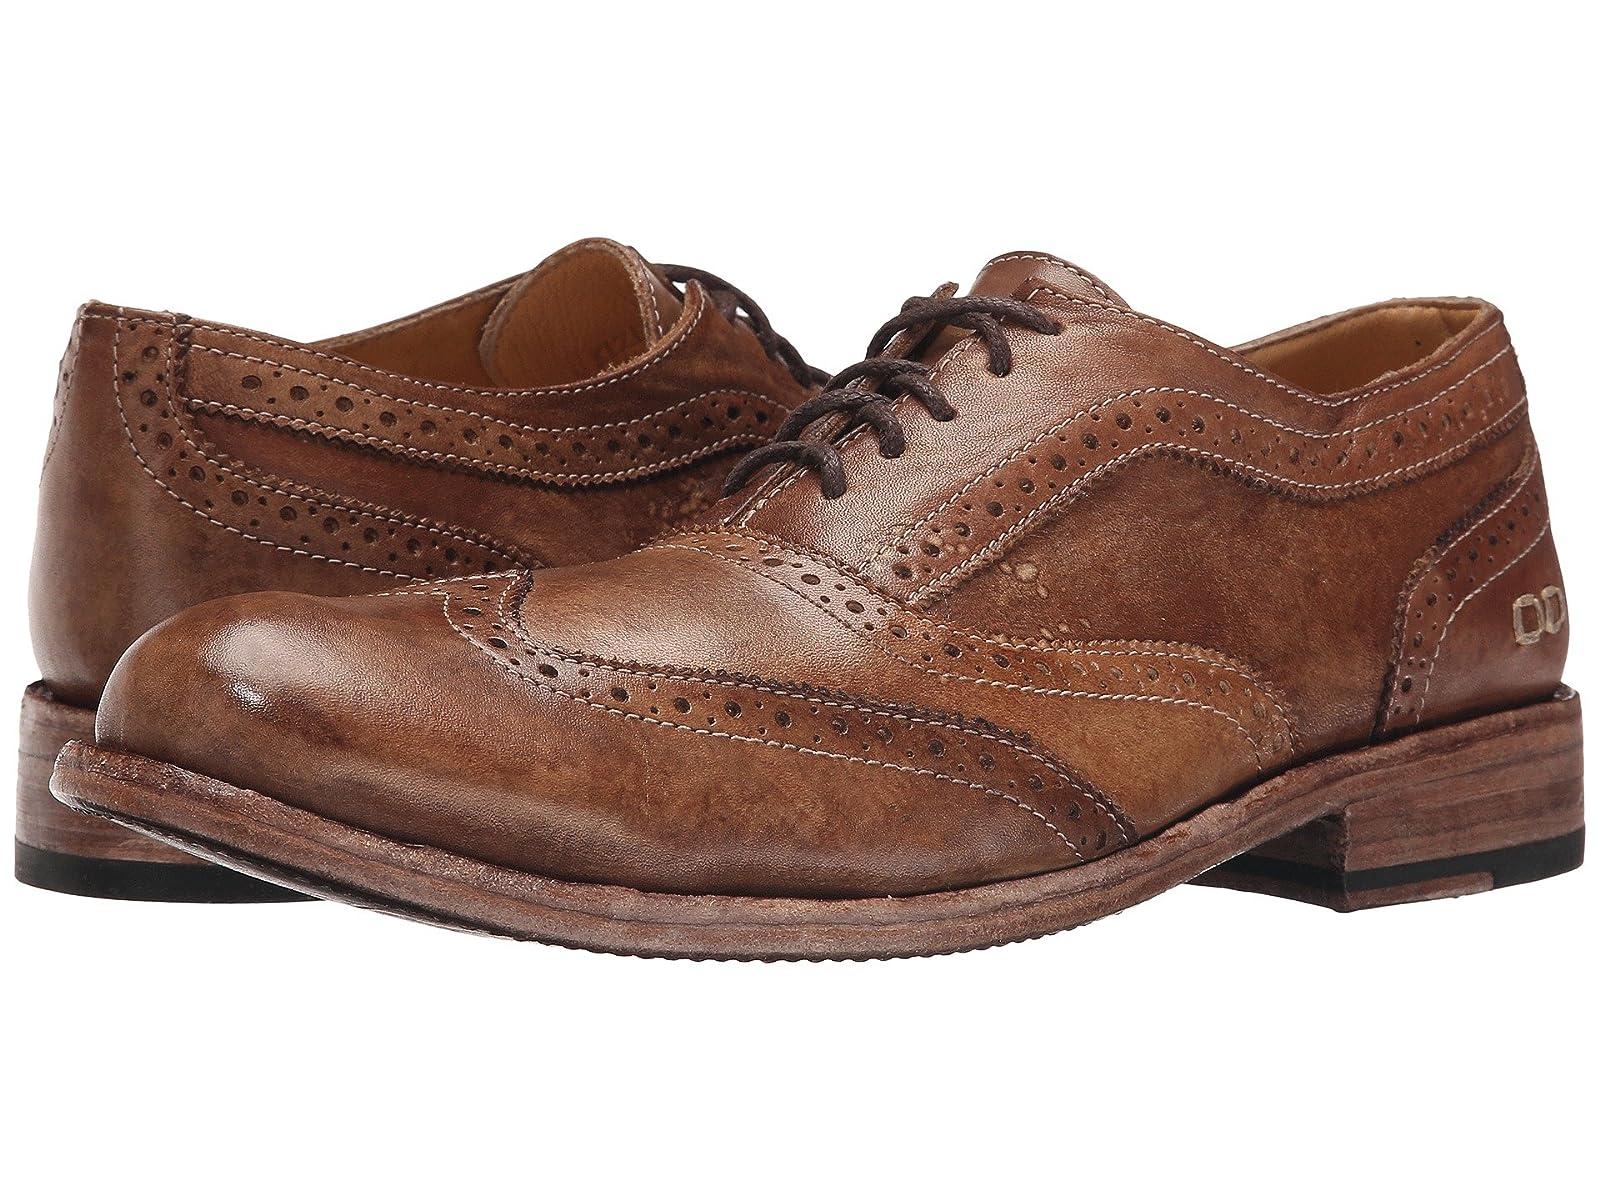 Bed Stu CorsicoAtmospheric grades have affordable shoes